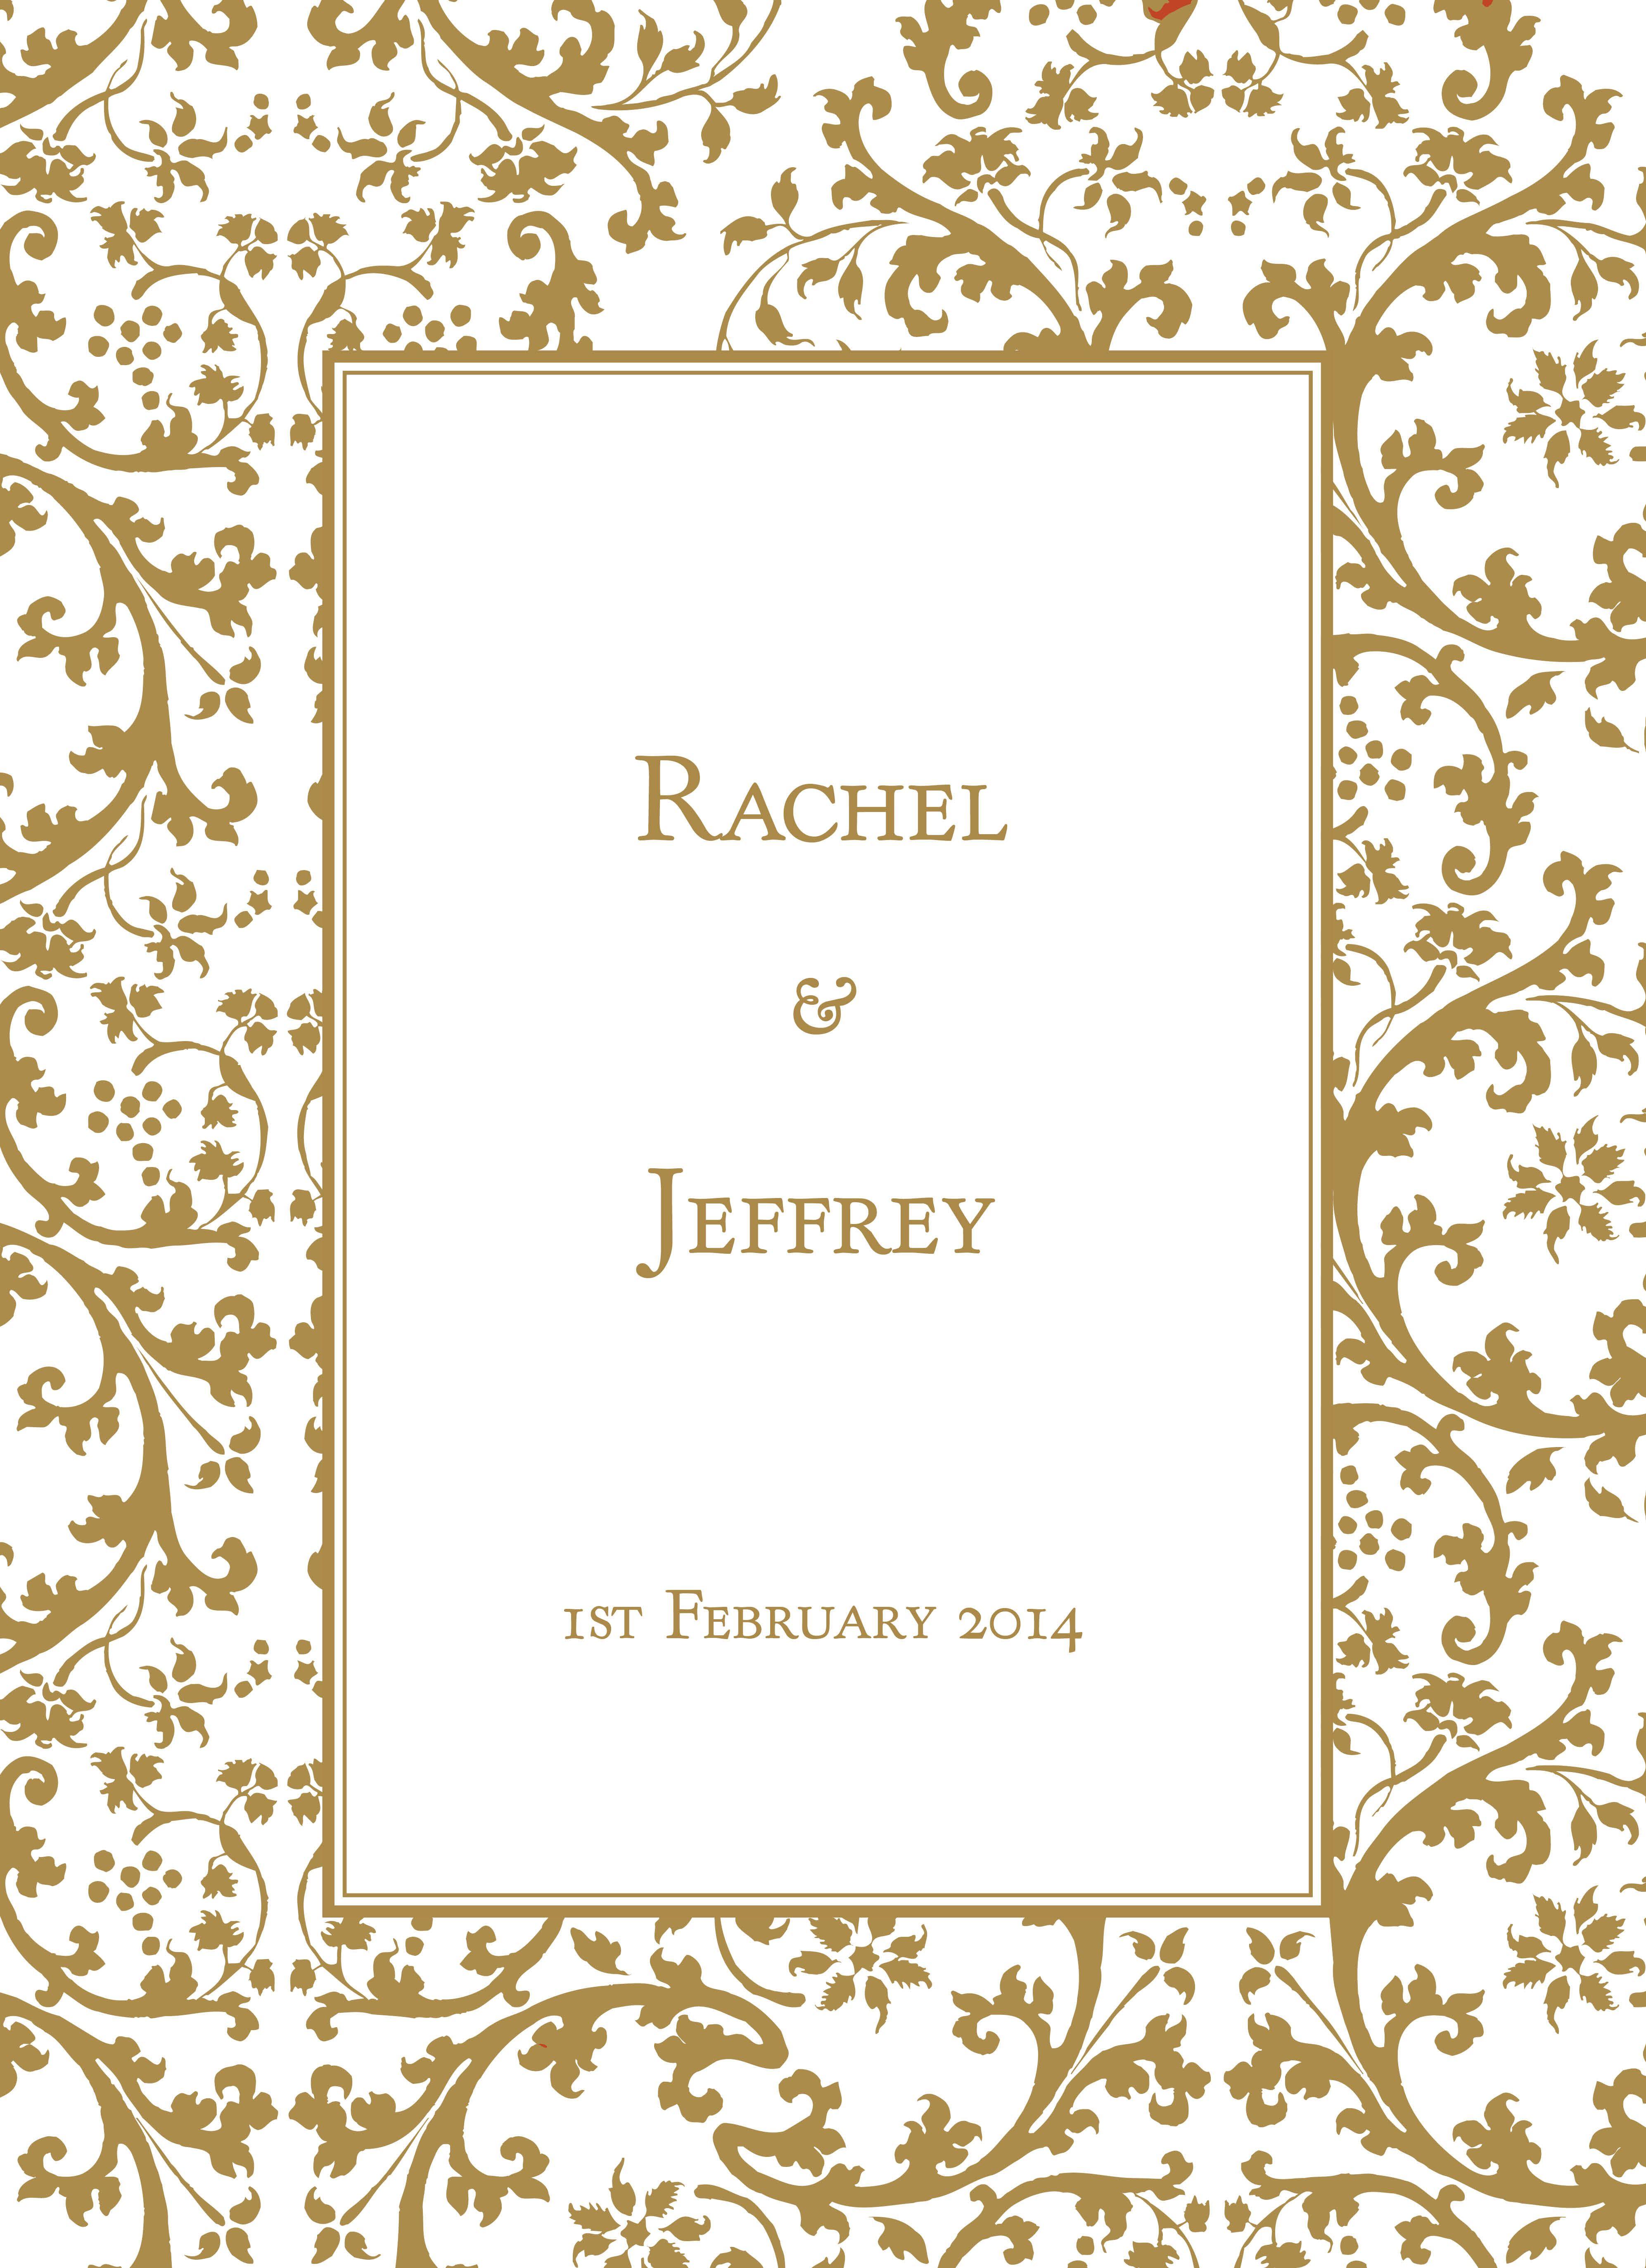 wedding invitations borders gold dreamday invitations gold ...